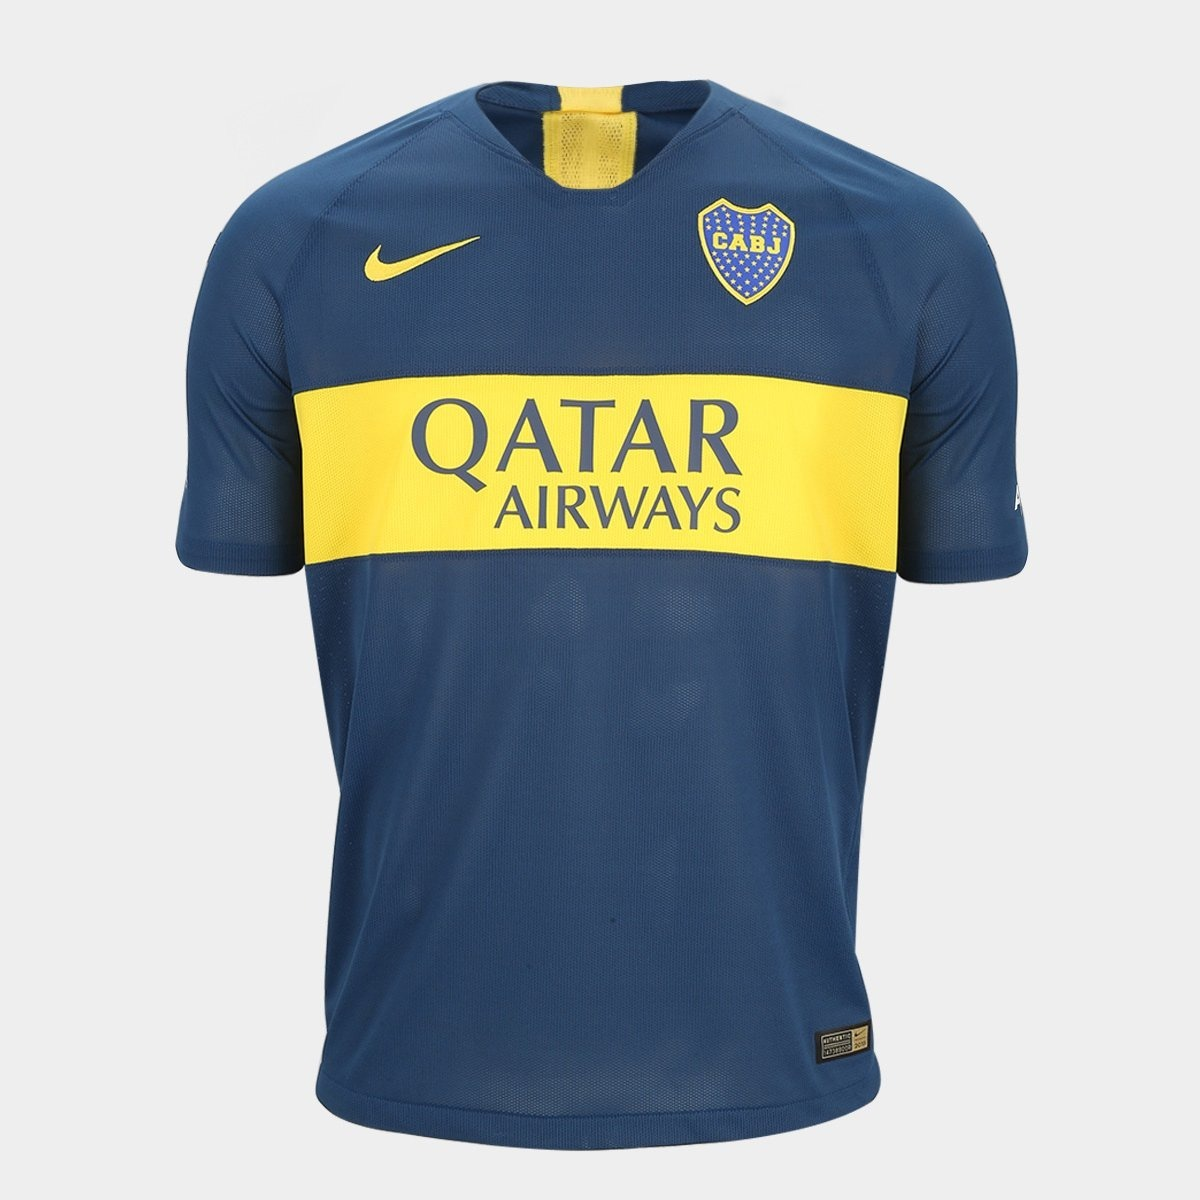 be8e9792a9cf6 nueva camiseta boca juniors 2019 original personalizable. Cargando zoom.